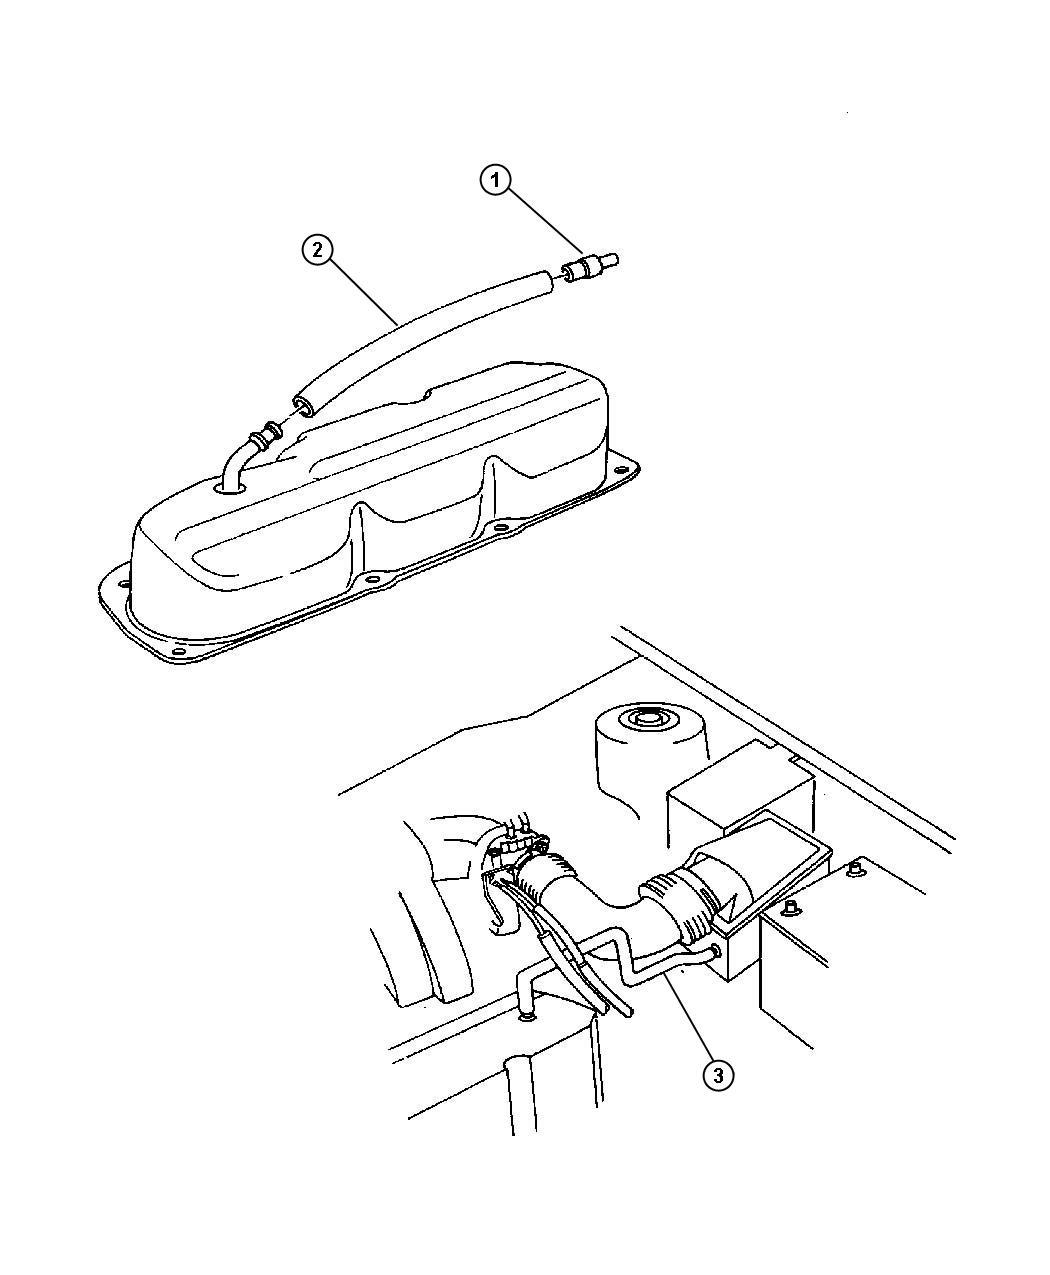 Chrysler Pt Cruiser Hose. Pcv valve to intake manifold